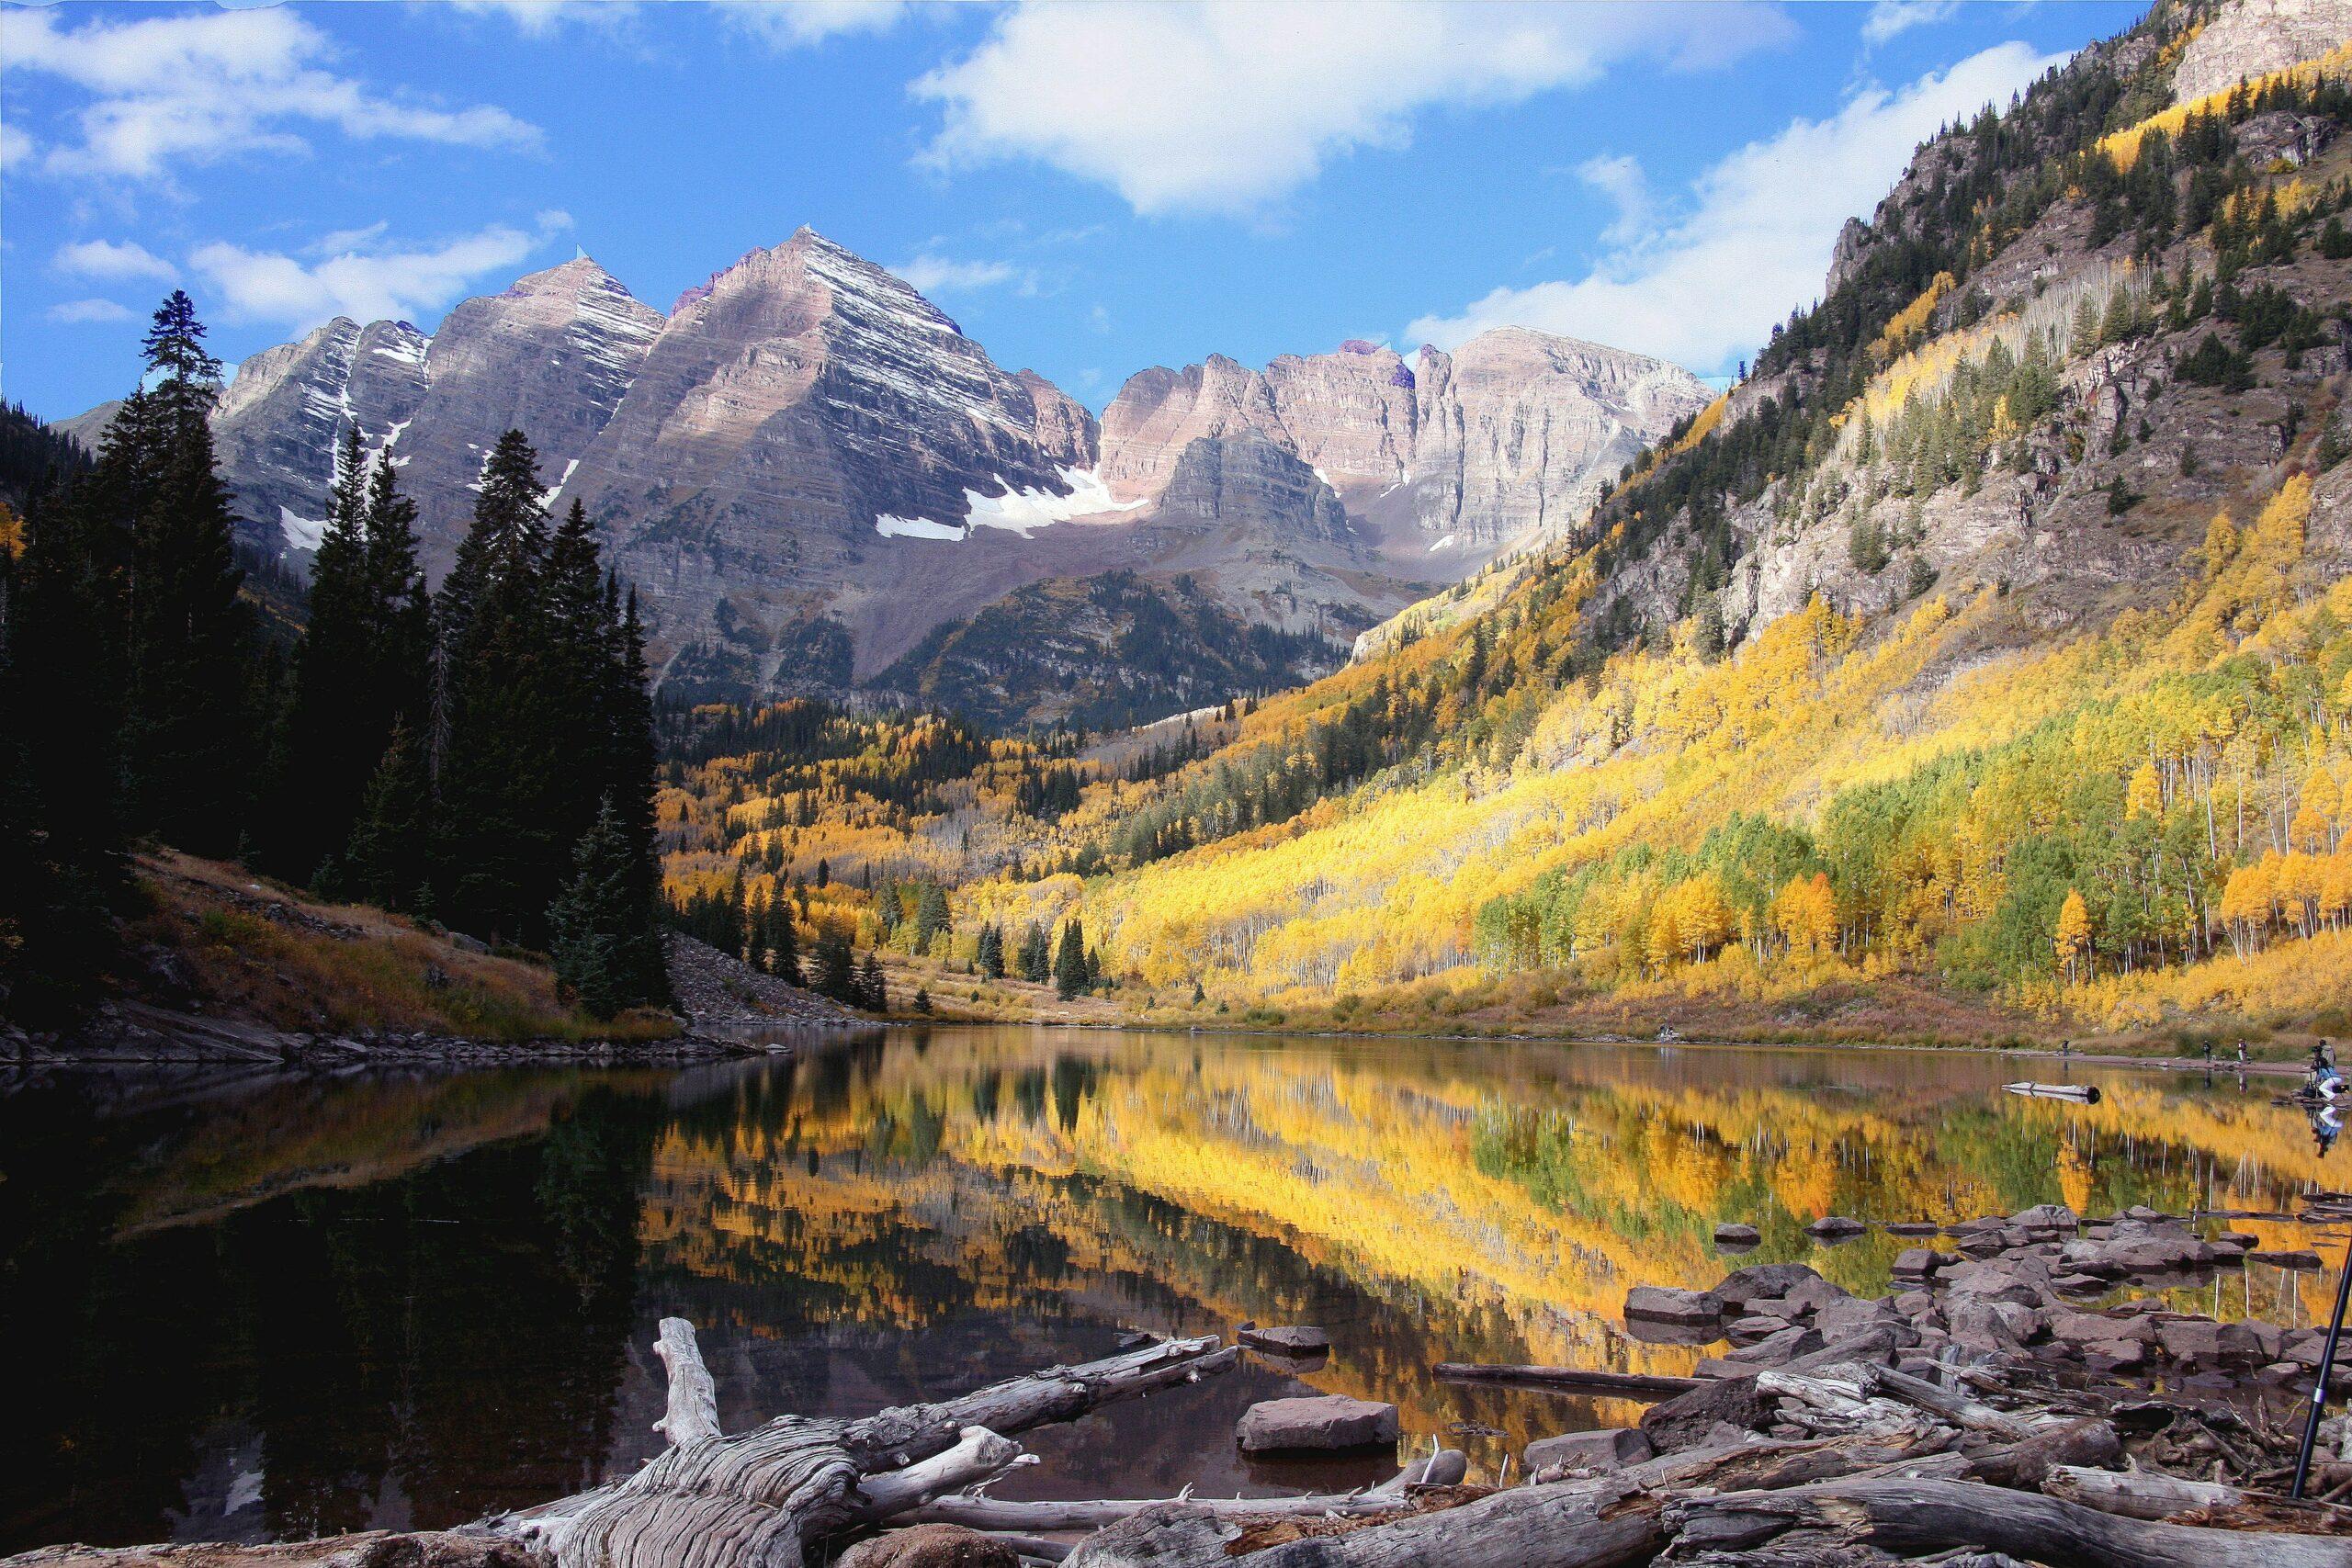 Colorado Cannabis Tax Revenues Hit $1 Billion